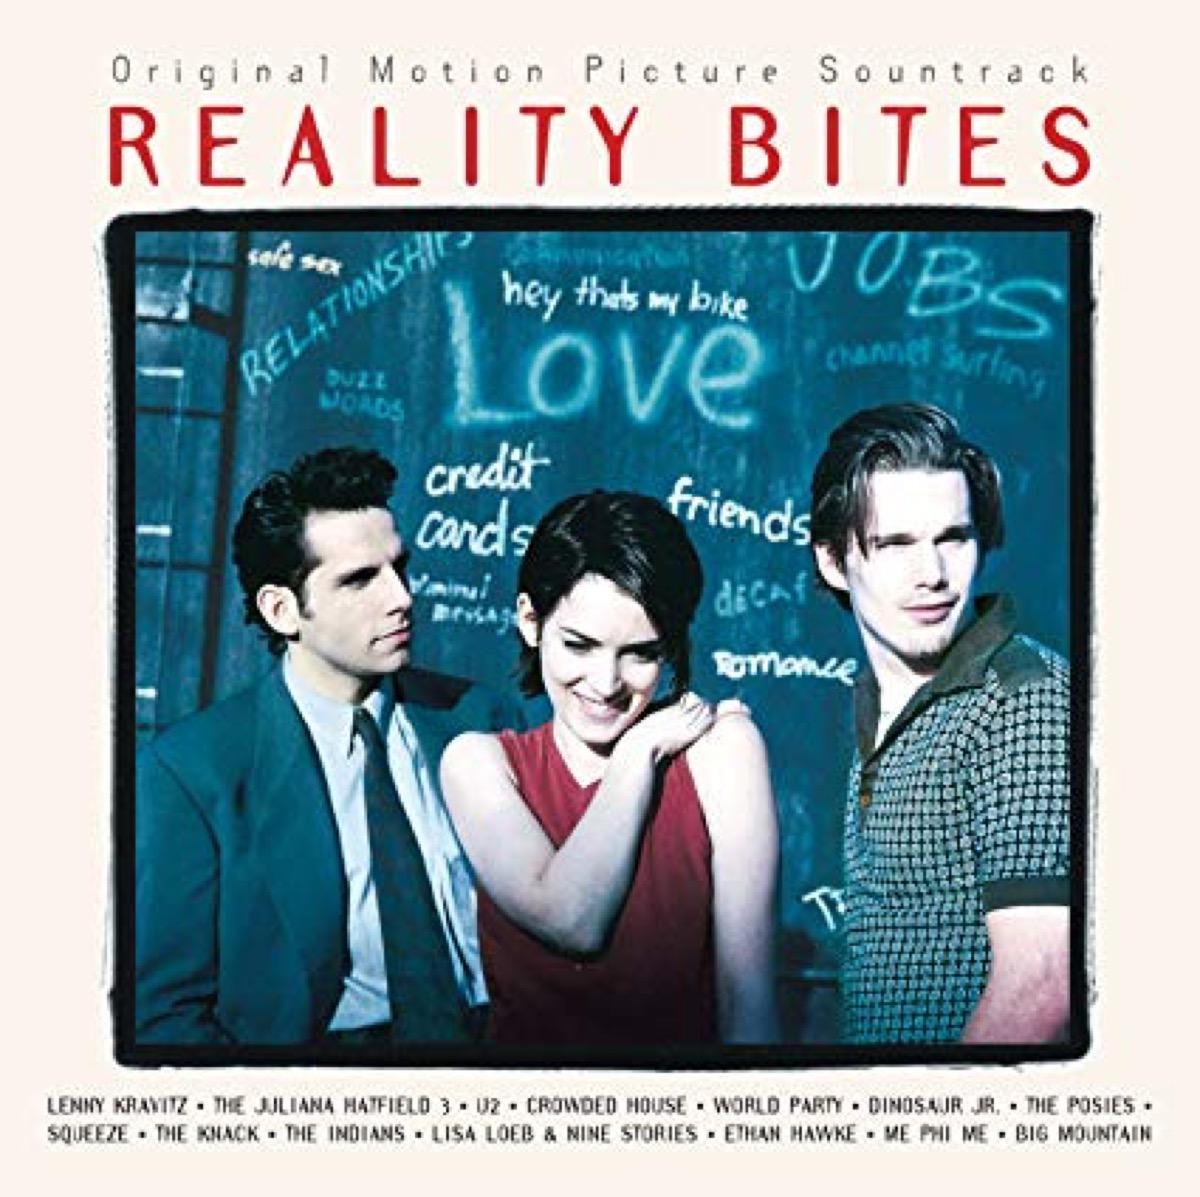 reality bites movie soundtrack cover